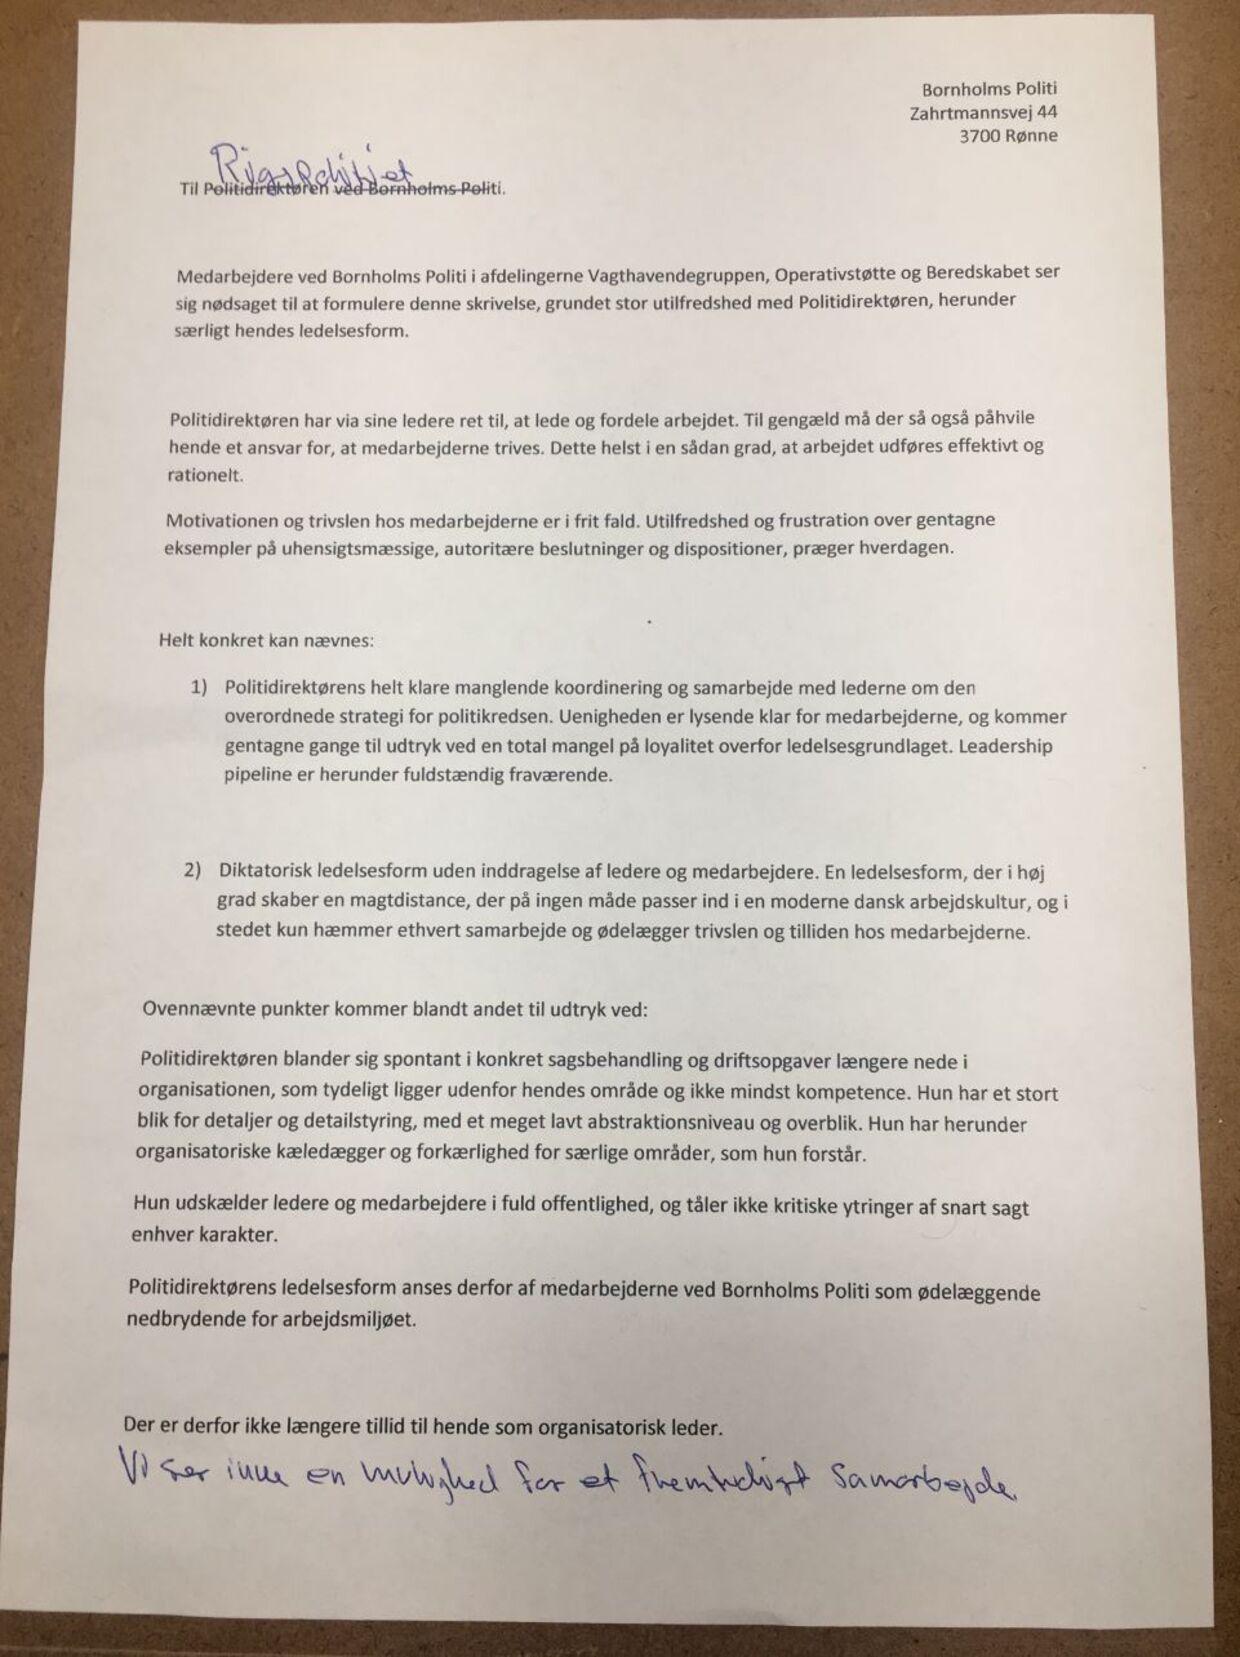 Medarbejdernes hos Bornholms Politis brev til Rigspolitiet om politidirektøren Kit Claudi Grøn-Iversen. Foto: Privat